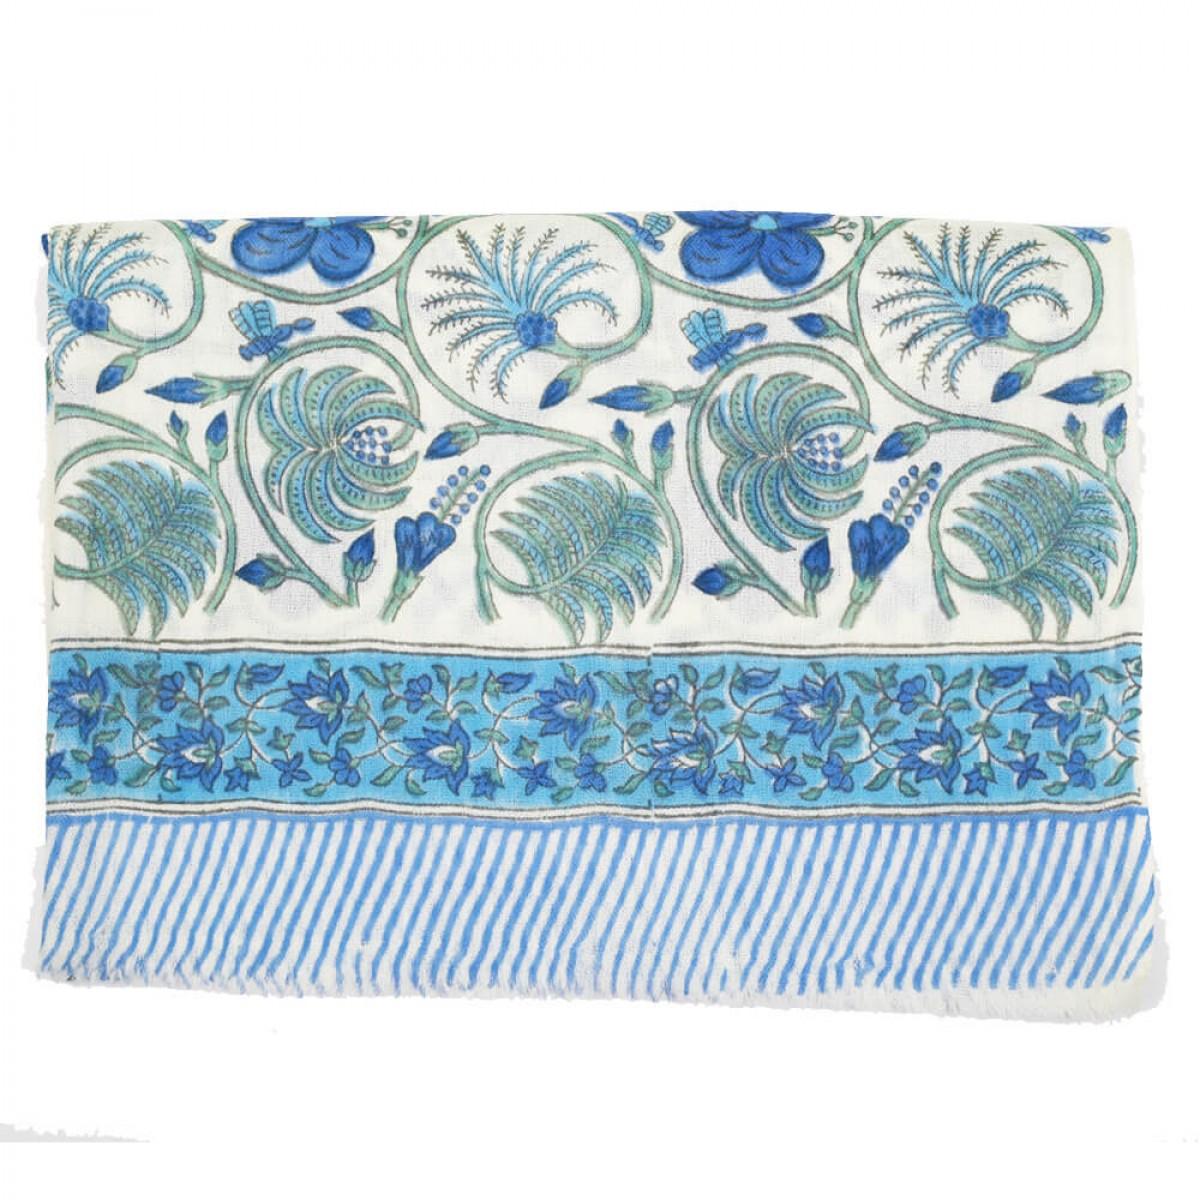 Block Printed Woolen Shawl - Cobalt